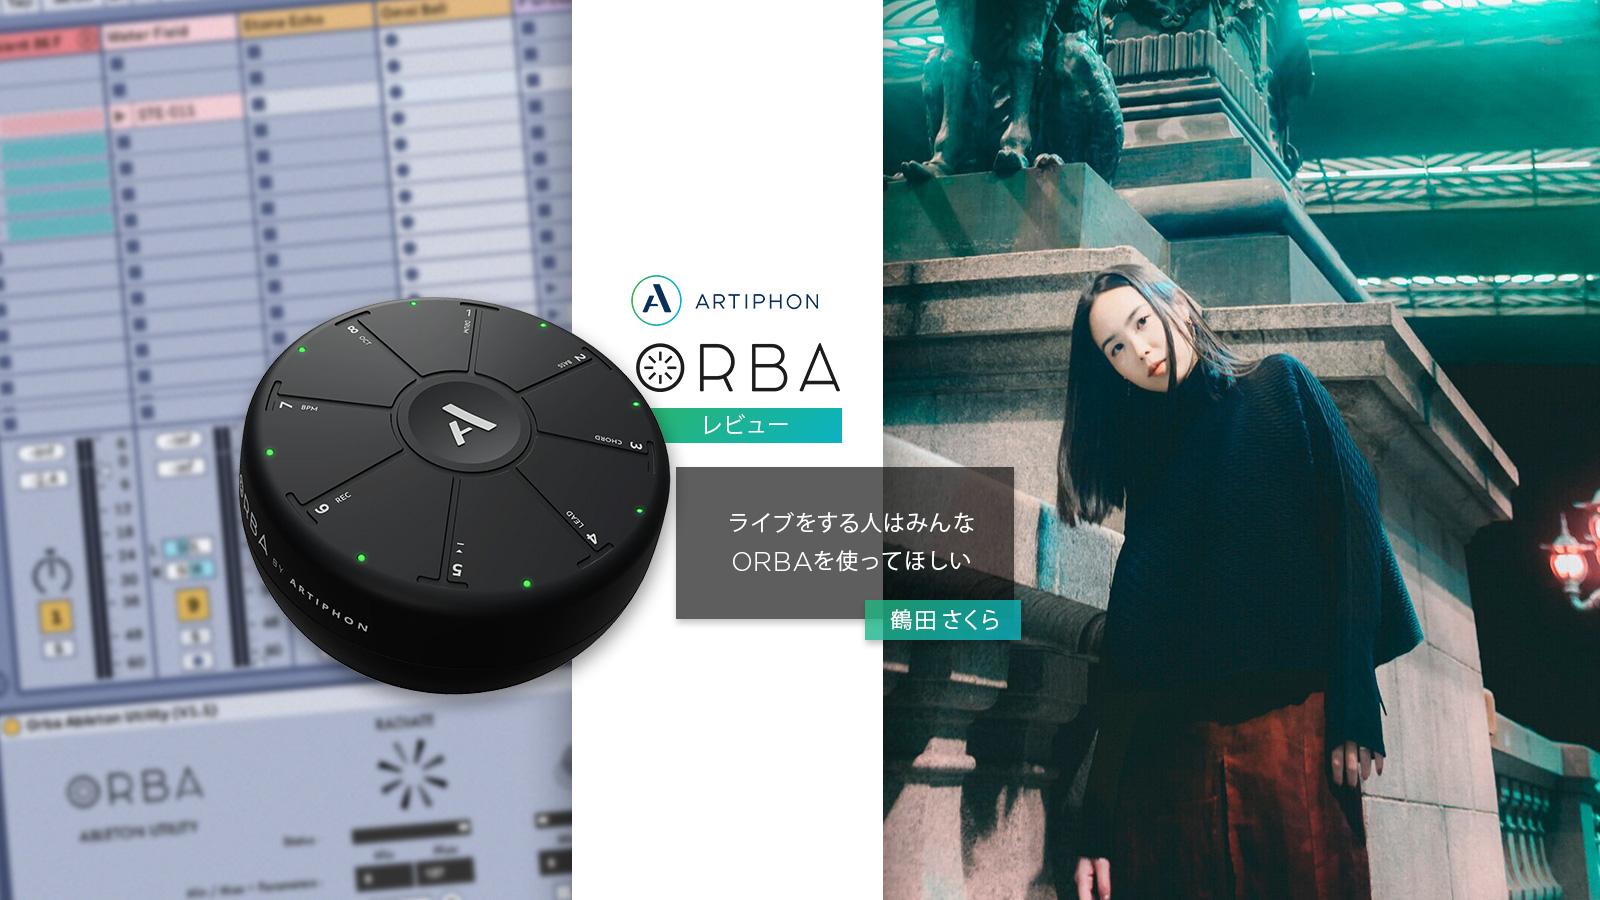 Artiphon ORBA レビュー:鶴田 さくら